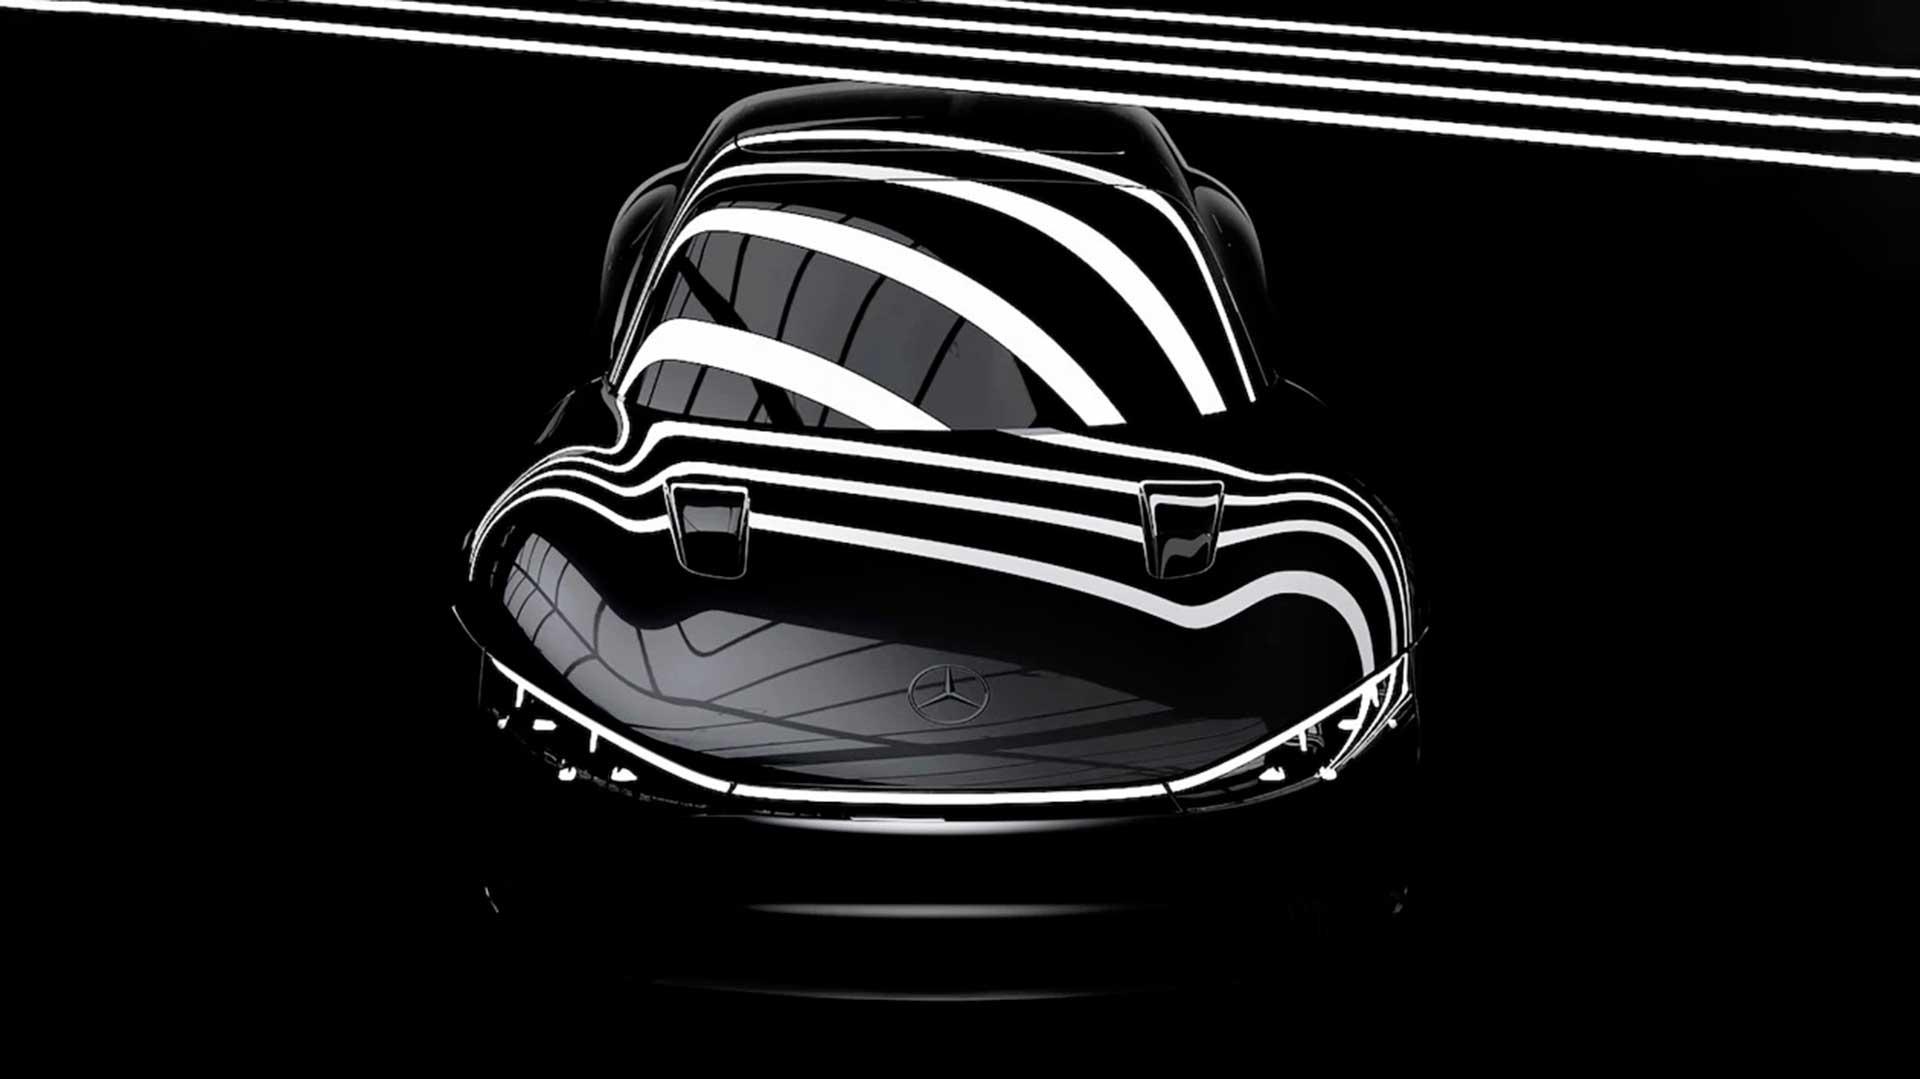 Teaser del Mercedes-Benz Vision EQXX: una berlina eléctrica con casi 1.000 km de autonomía